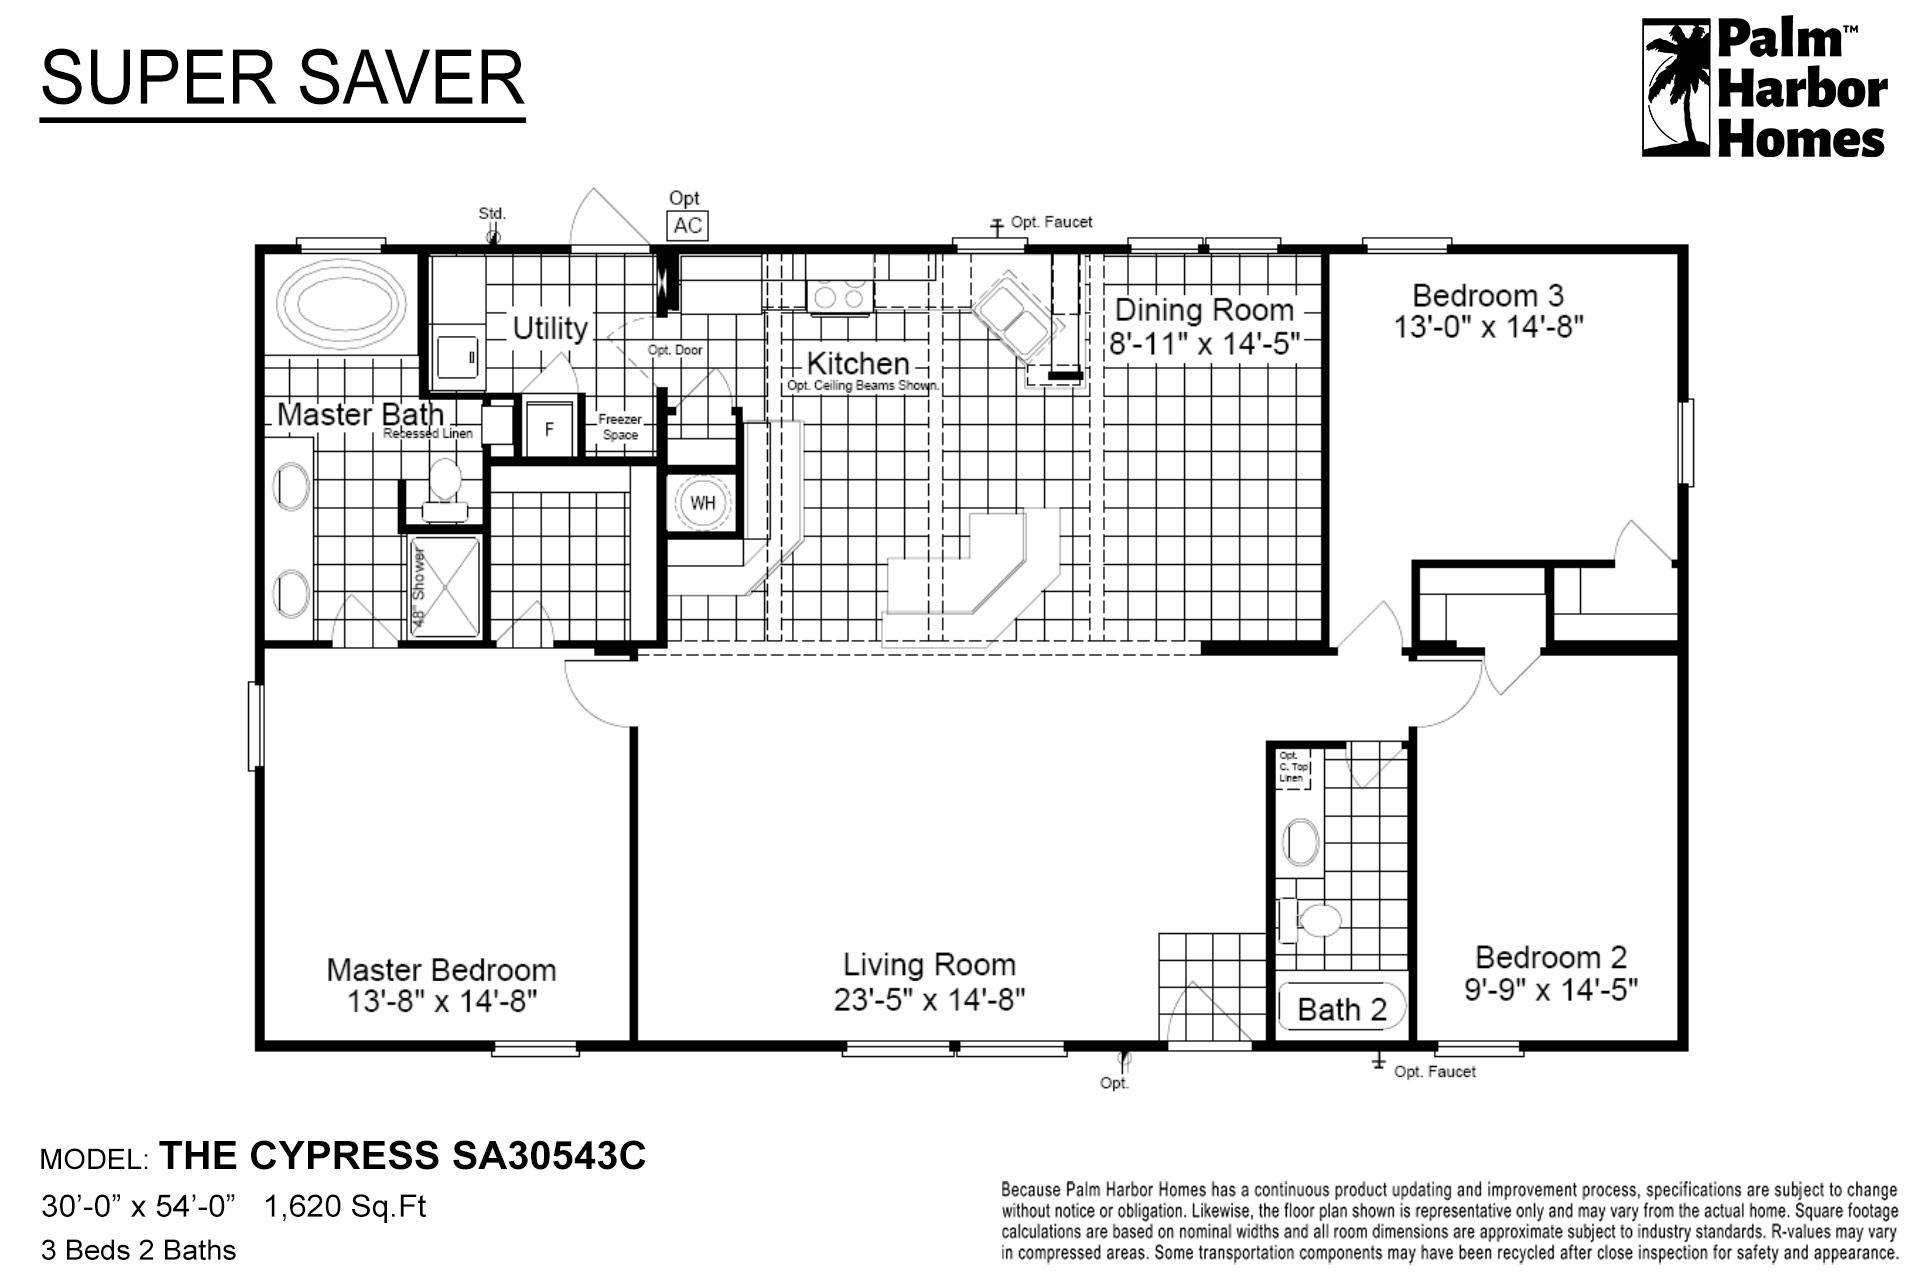 Super Saver - The Cypress SA30543C